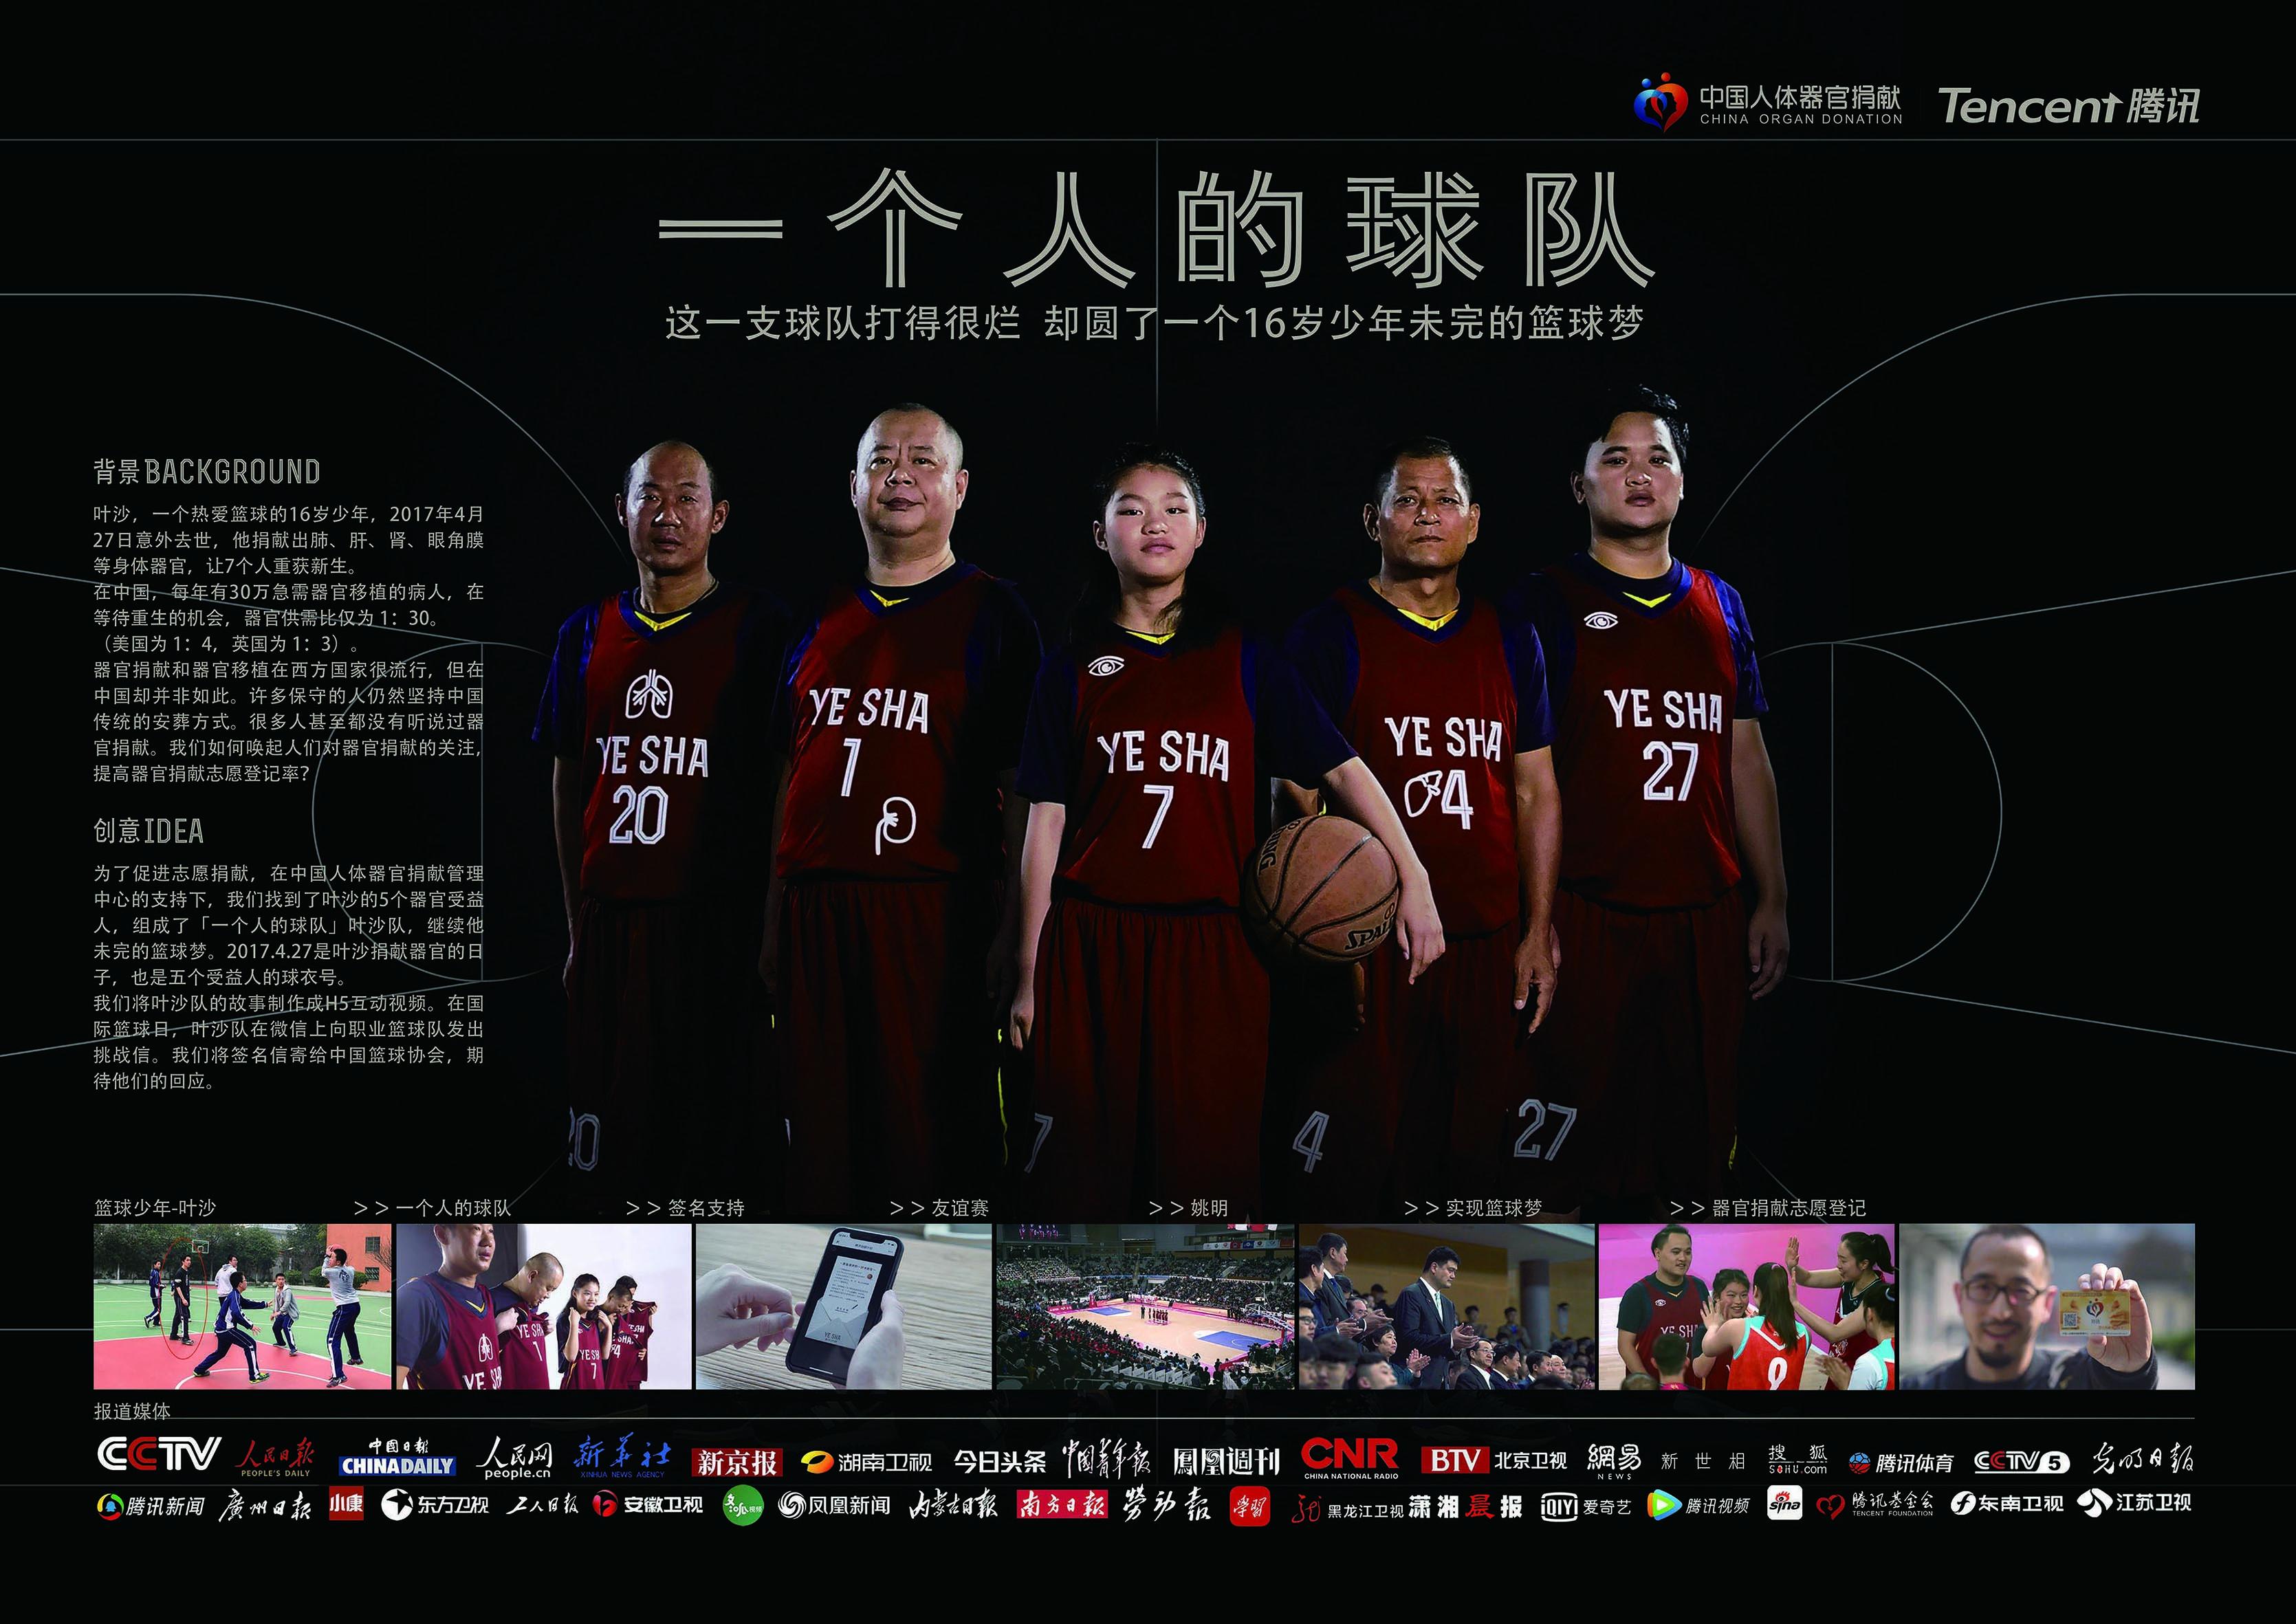 2019_cn_2019_e192-se-164673022_hero_1